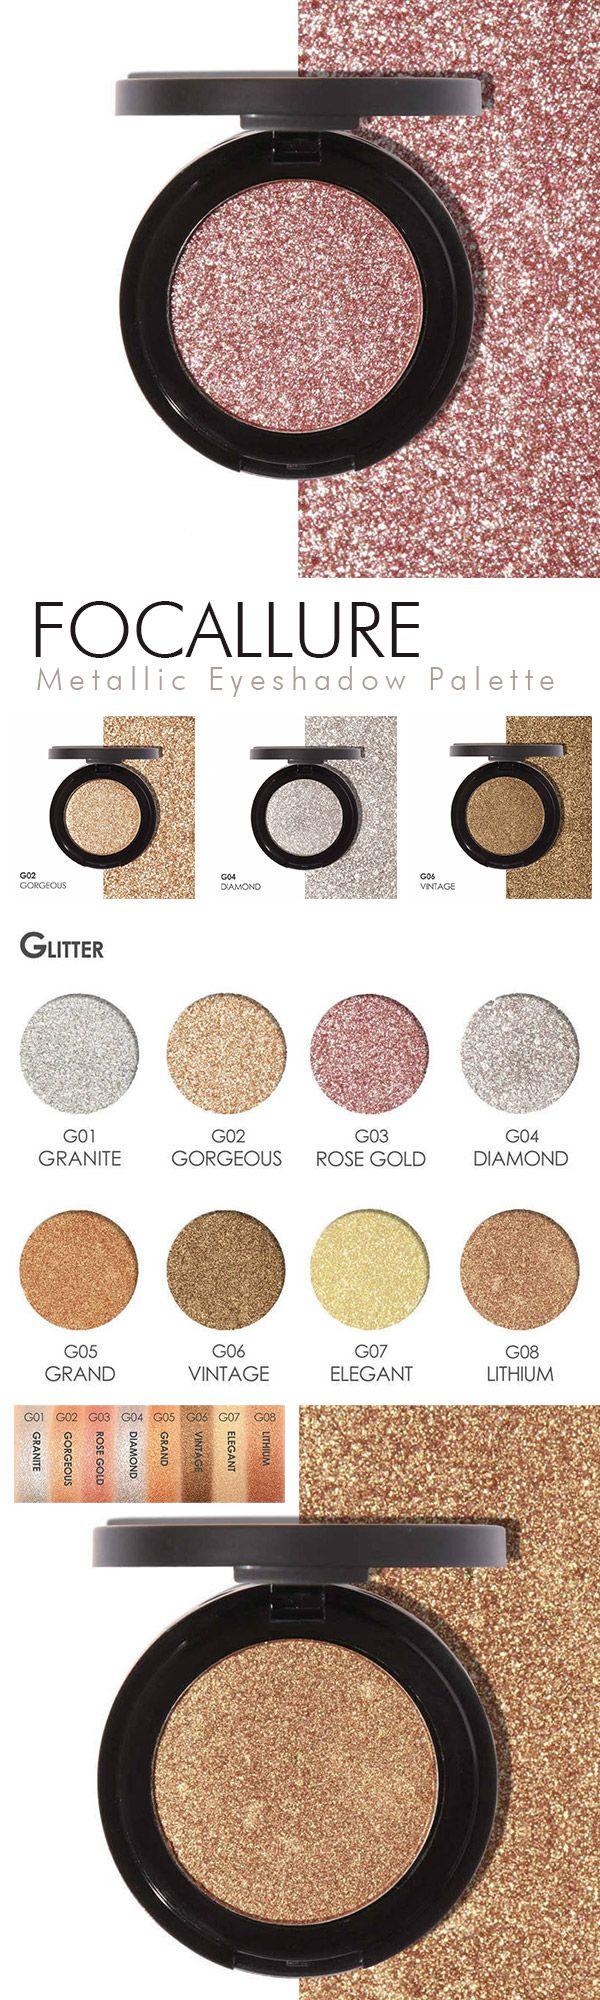 FOCALLURE Metallic Eyeshadow Palette Glitter Shimmer Matte Makeup Eye Shadow Make Up